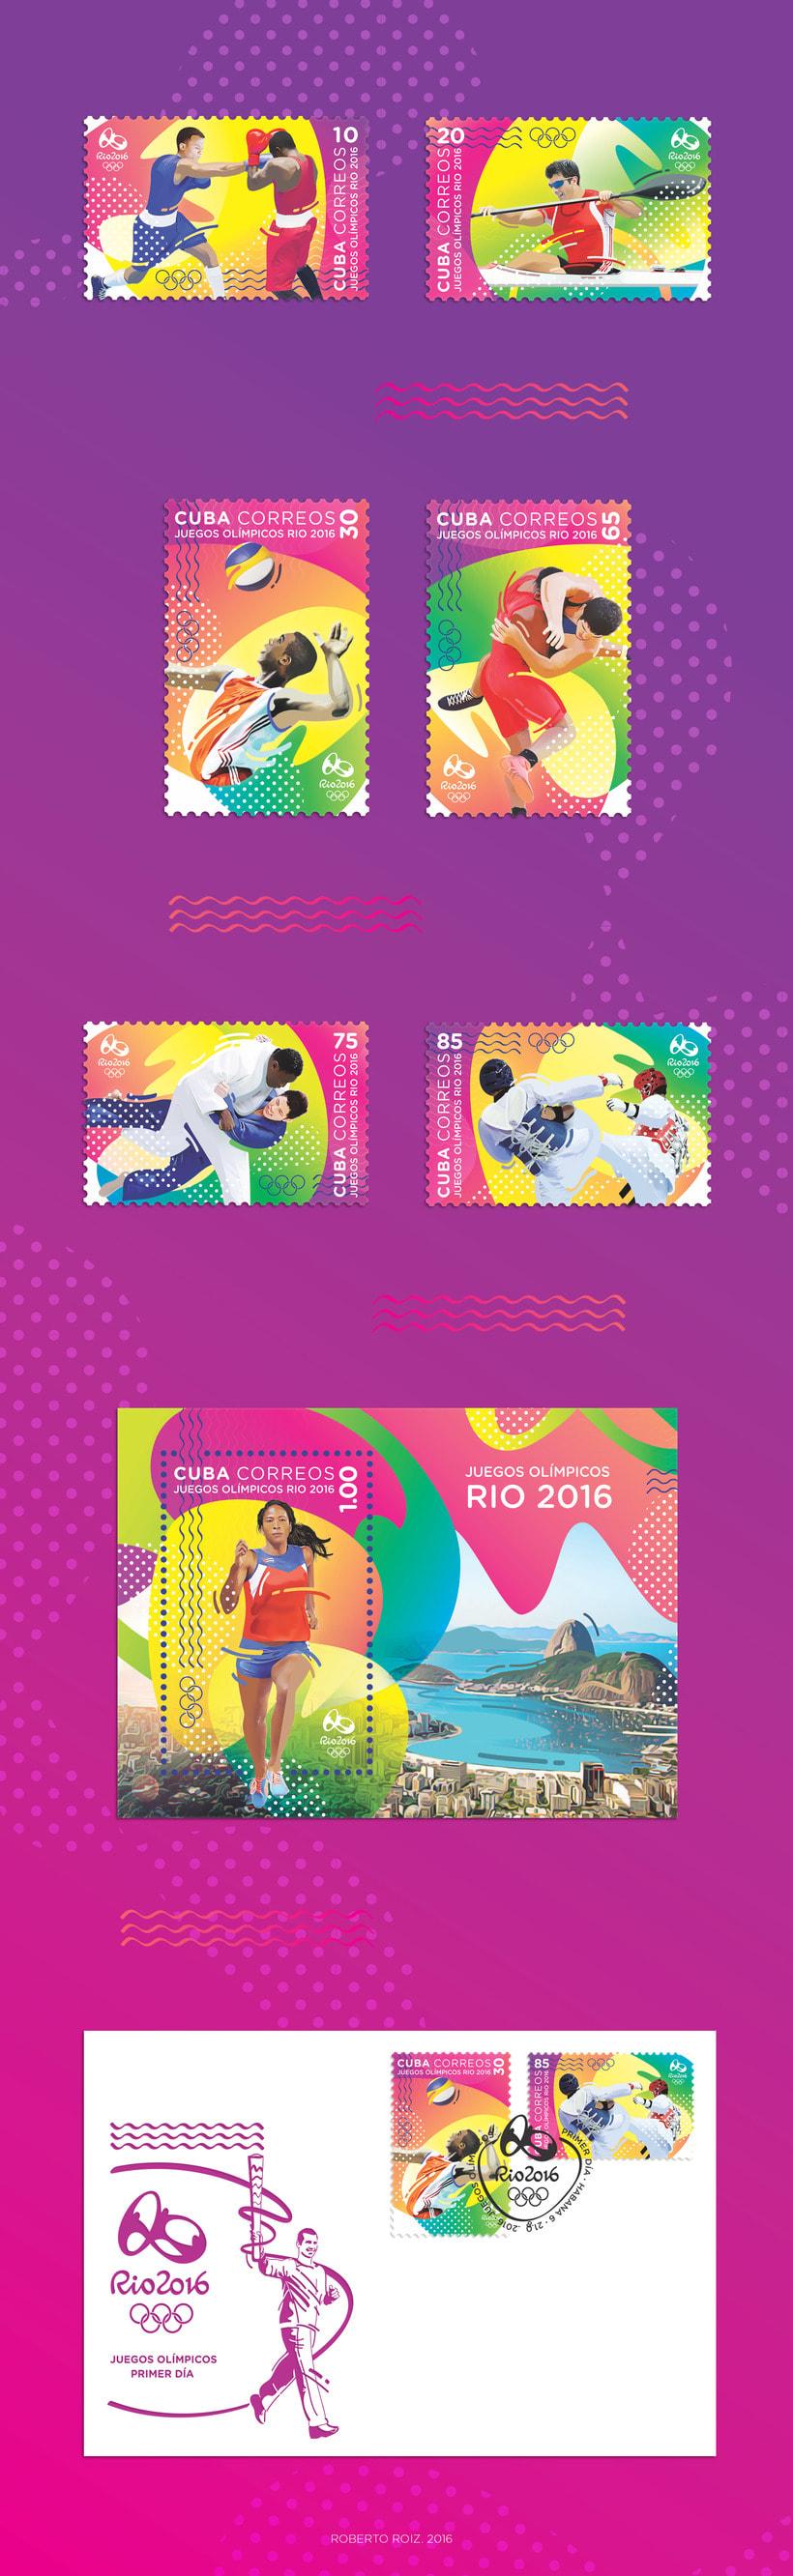 Juegos Olímpicos Rio 2016. Sello postal -1